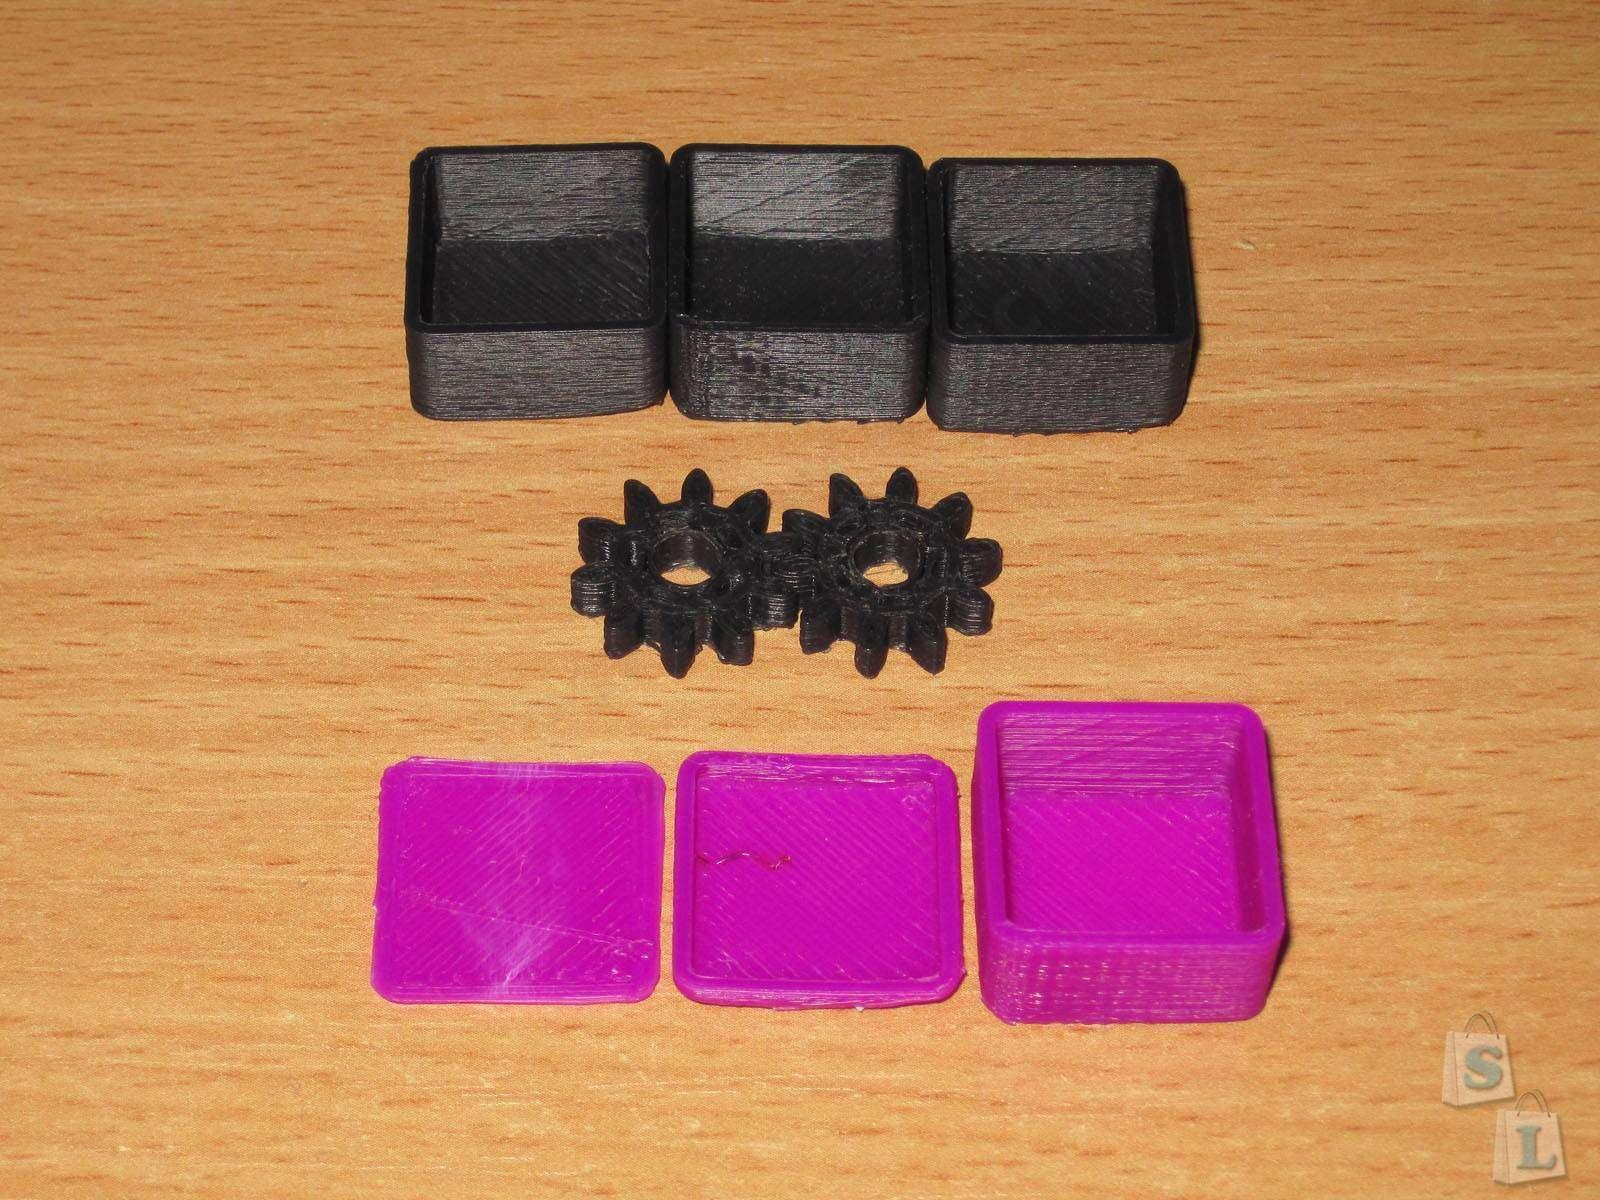 GearBest: ZONESTAR P802, он же Prusa i3 или строим 3D принтер из конструктора